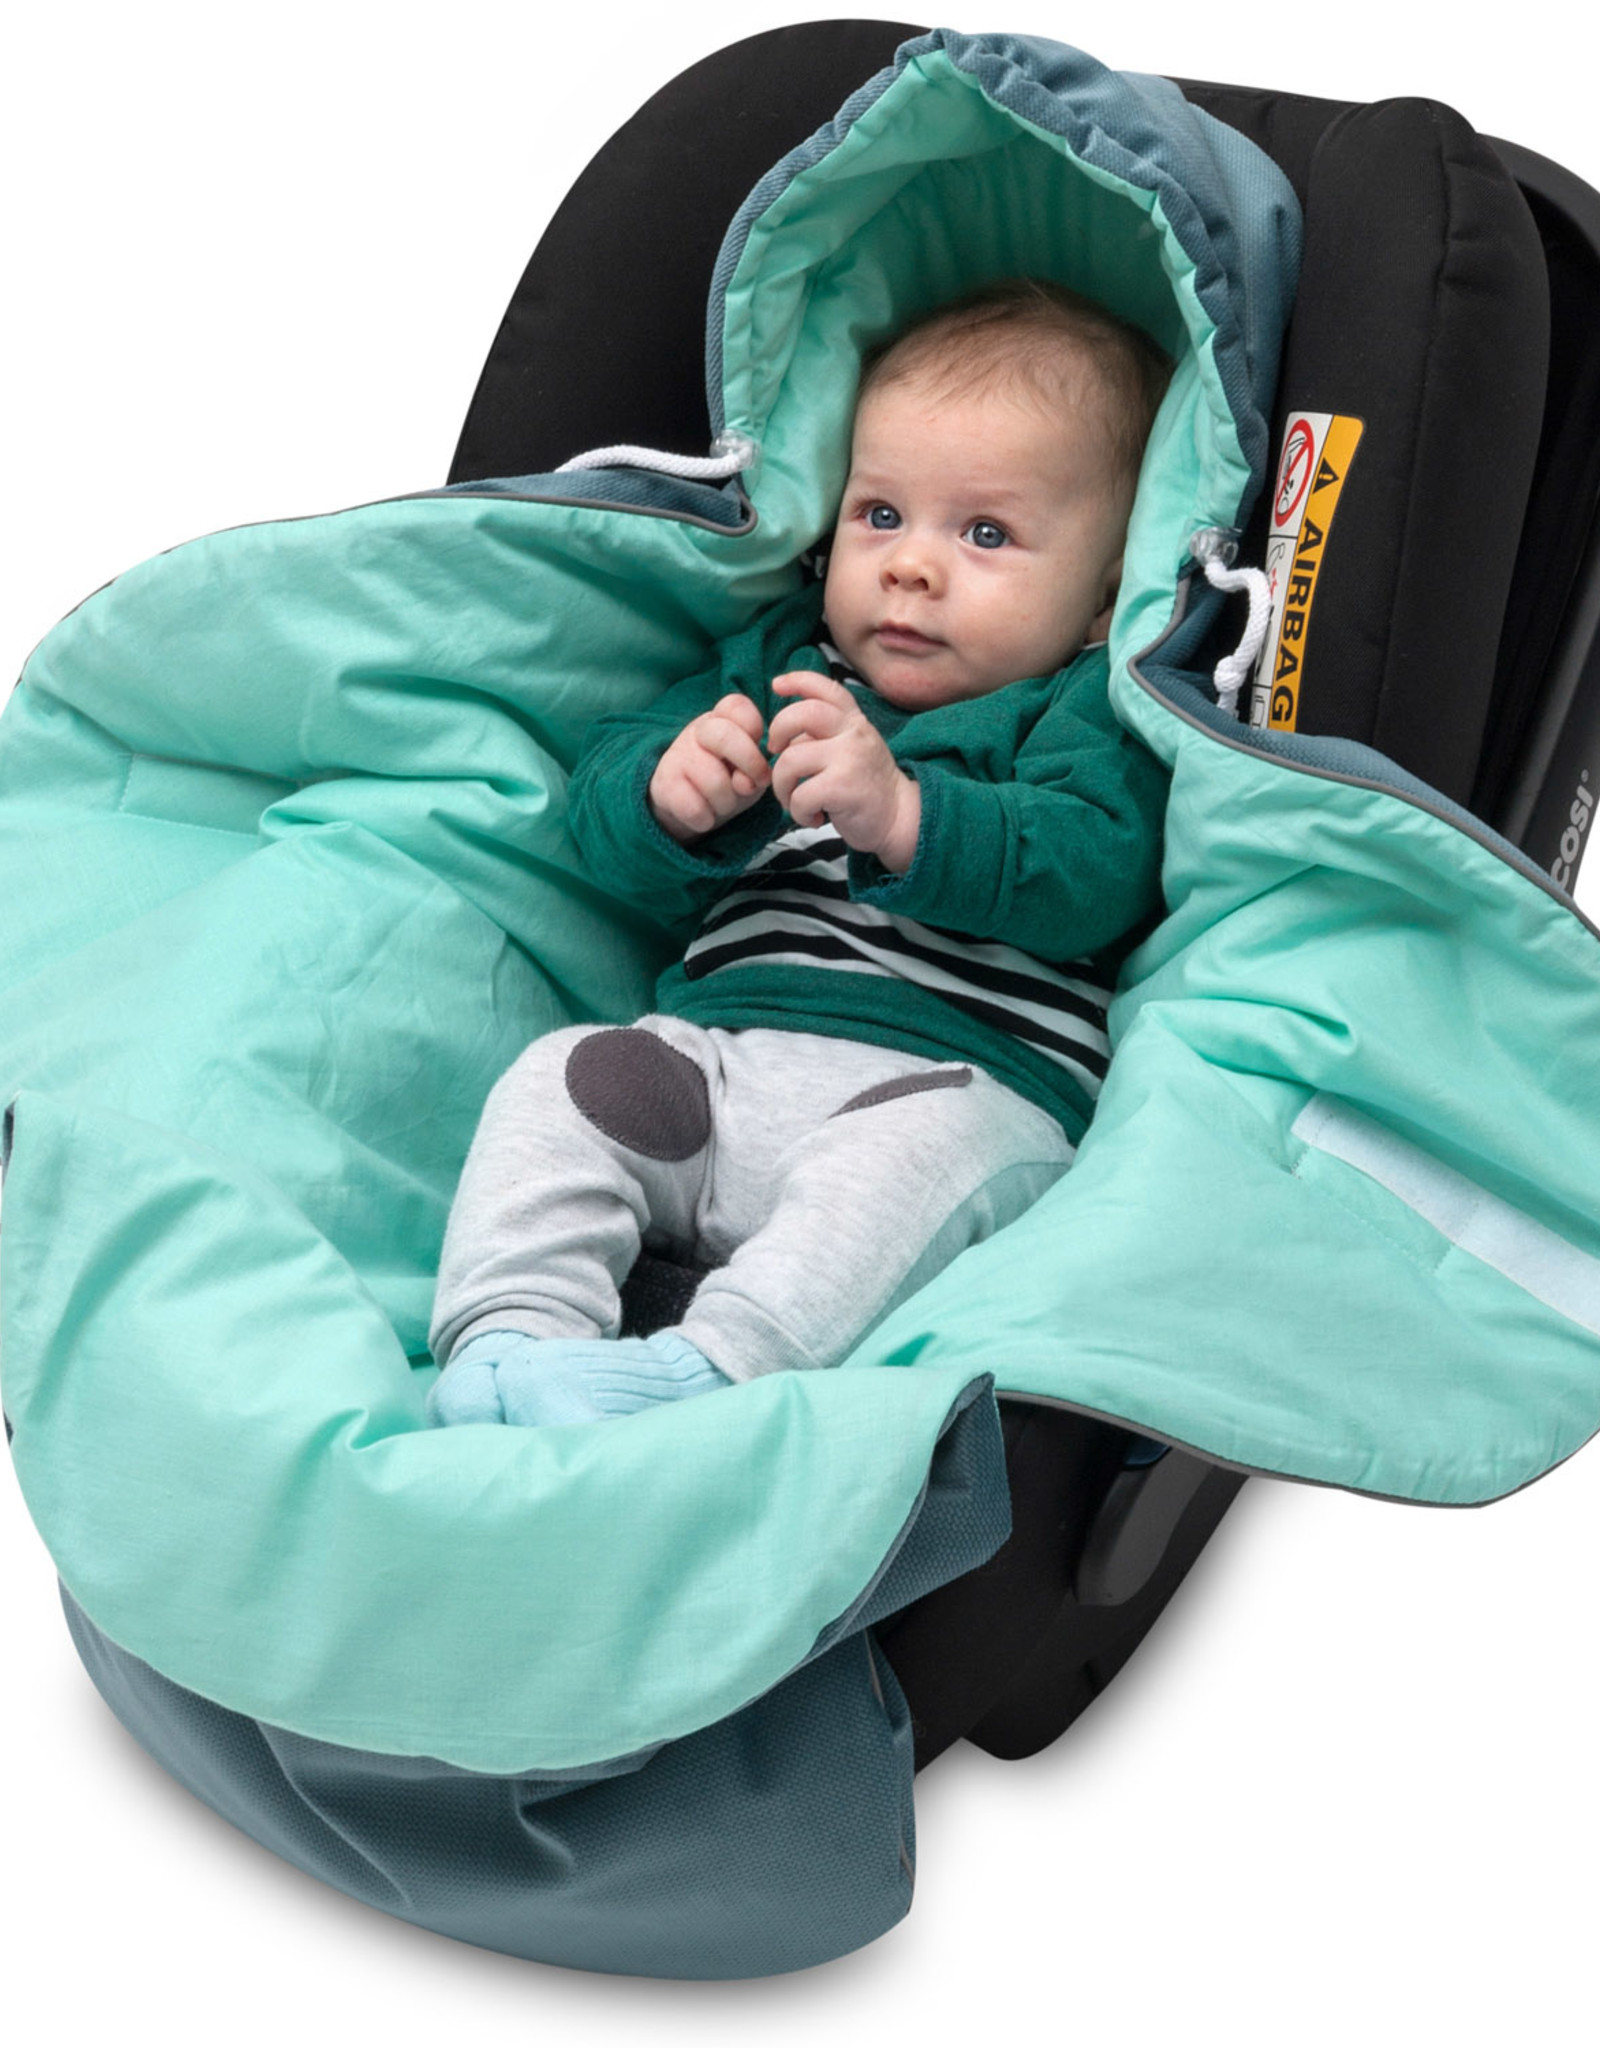 Dekens Autostoeltje - Groen